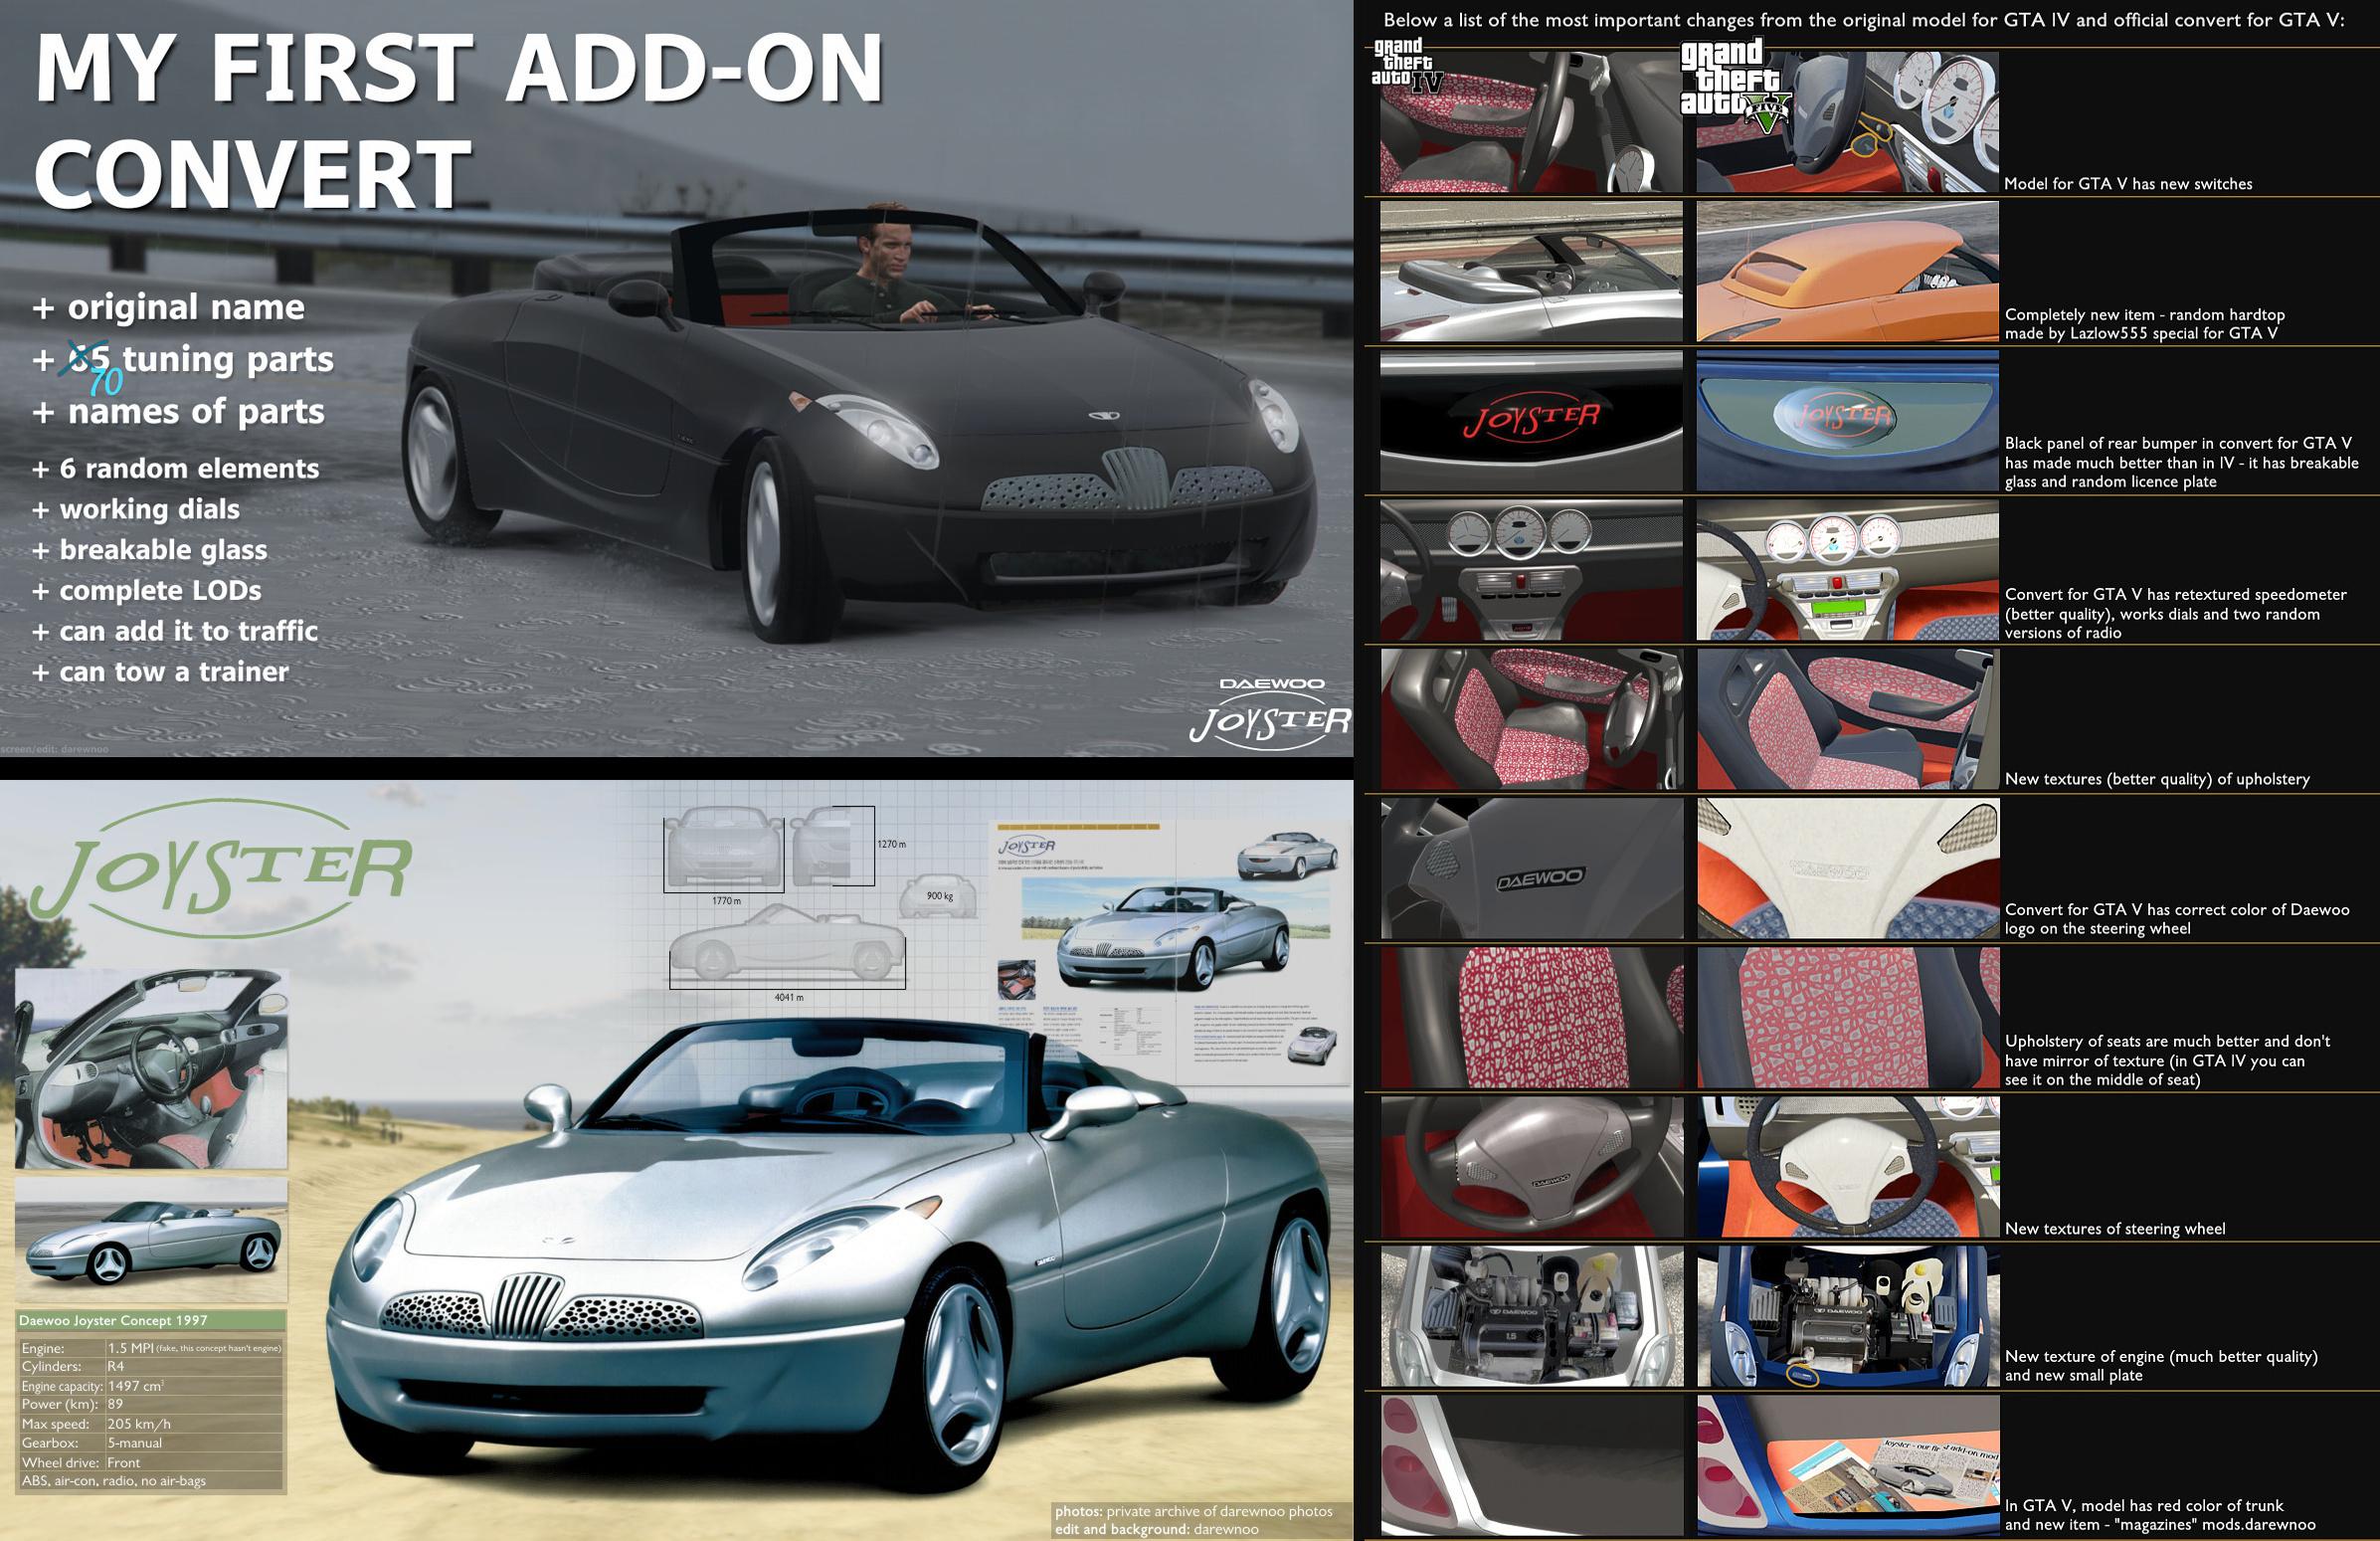 1997 Daewoo Joyster Concept [Add-On / Replace | Tuning] - GTA5-Mods.com